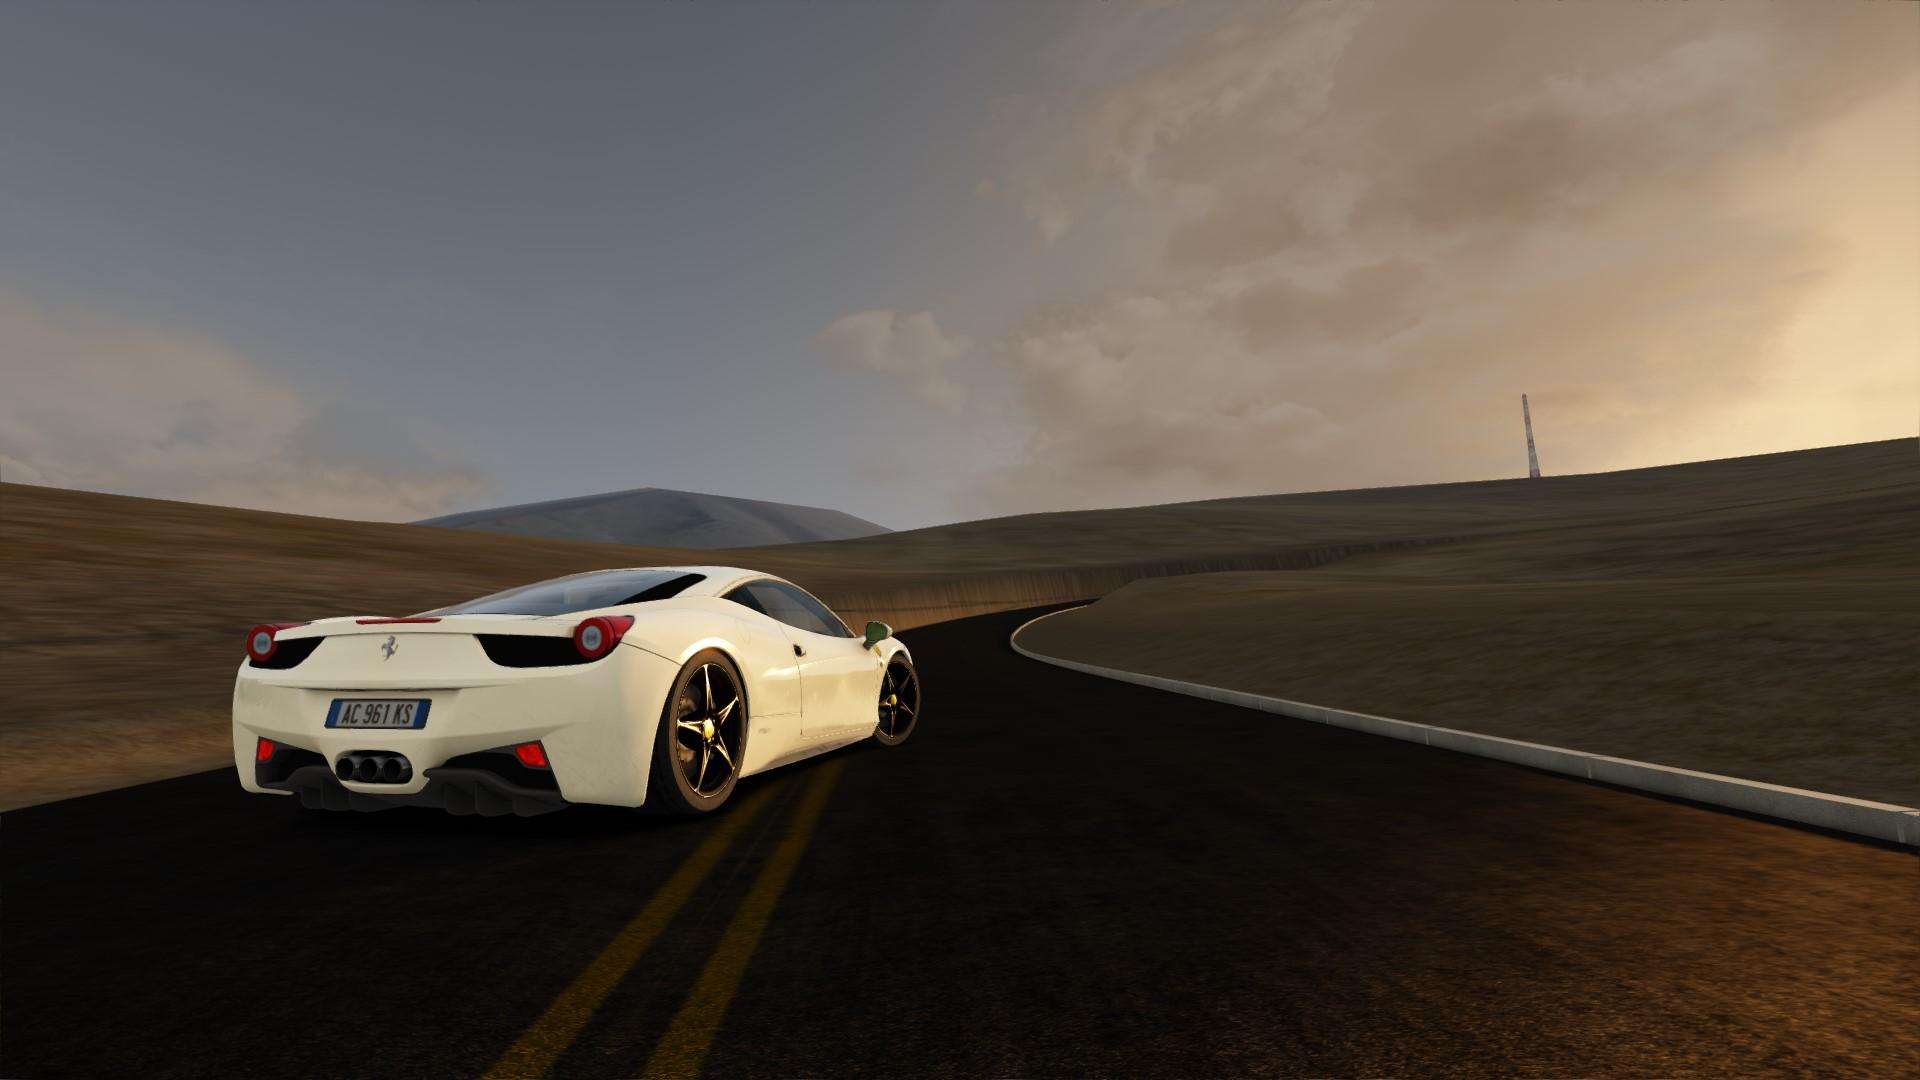 Screenshot_ferrari_458_s3_mlt_ocharaza_8-3-118-19-24-57.jpg